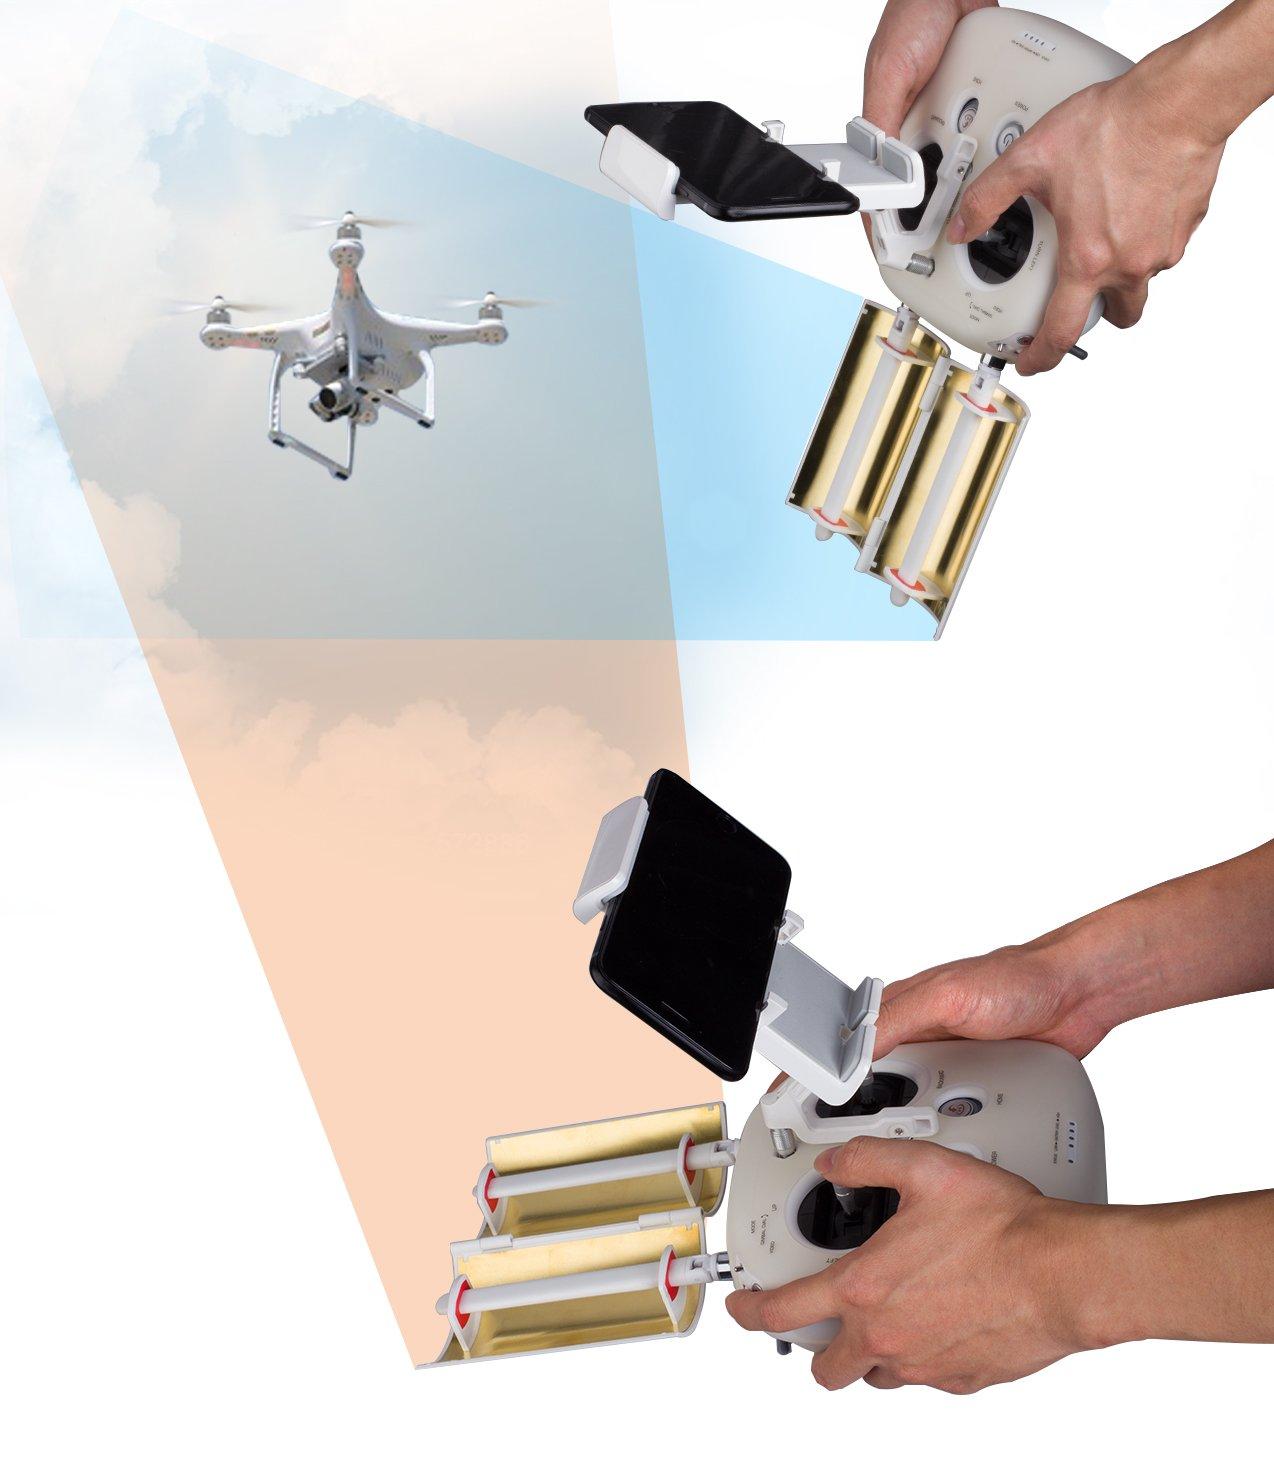 Tozo Antenna Signal Range Booster Parabolic Foldable For Amplifier Dji Phantom 3 4 Inspire 1 2 Pro Advanced Professional Controller Transmitter